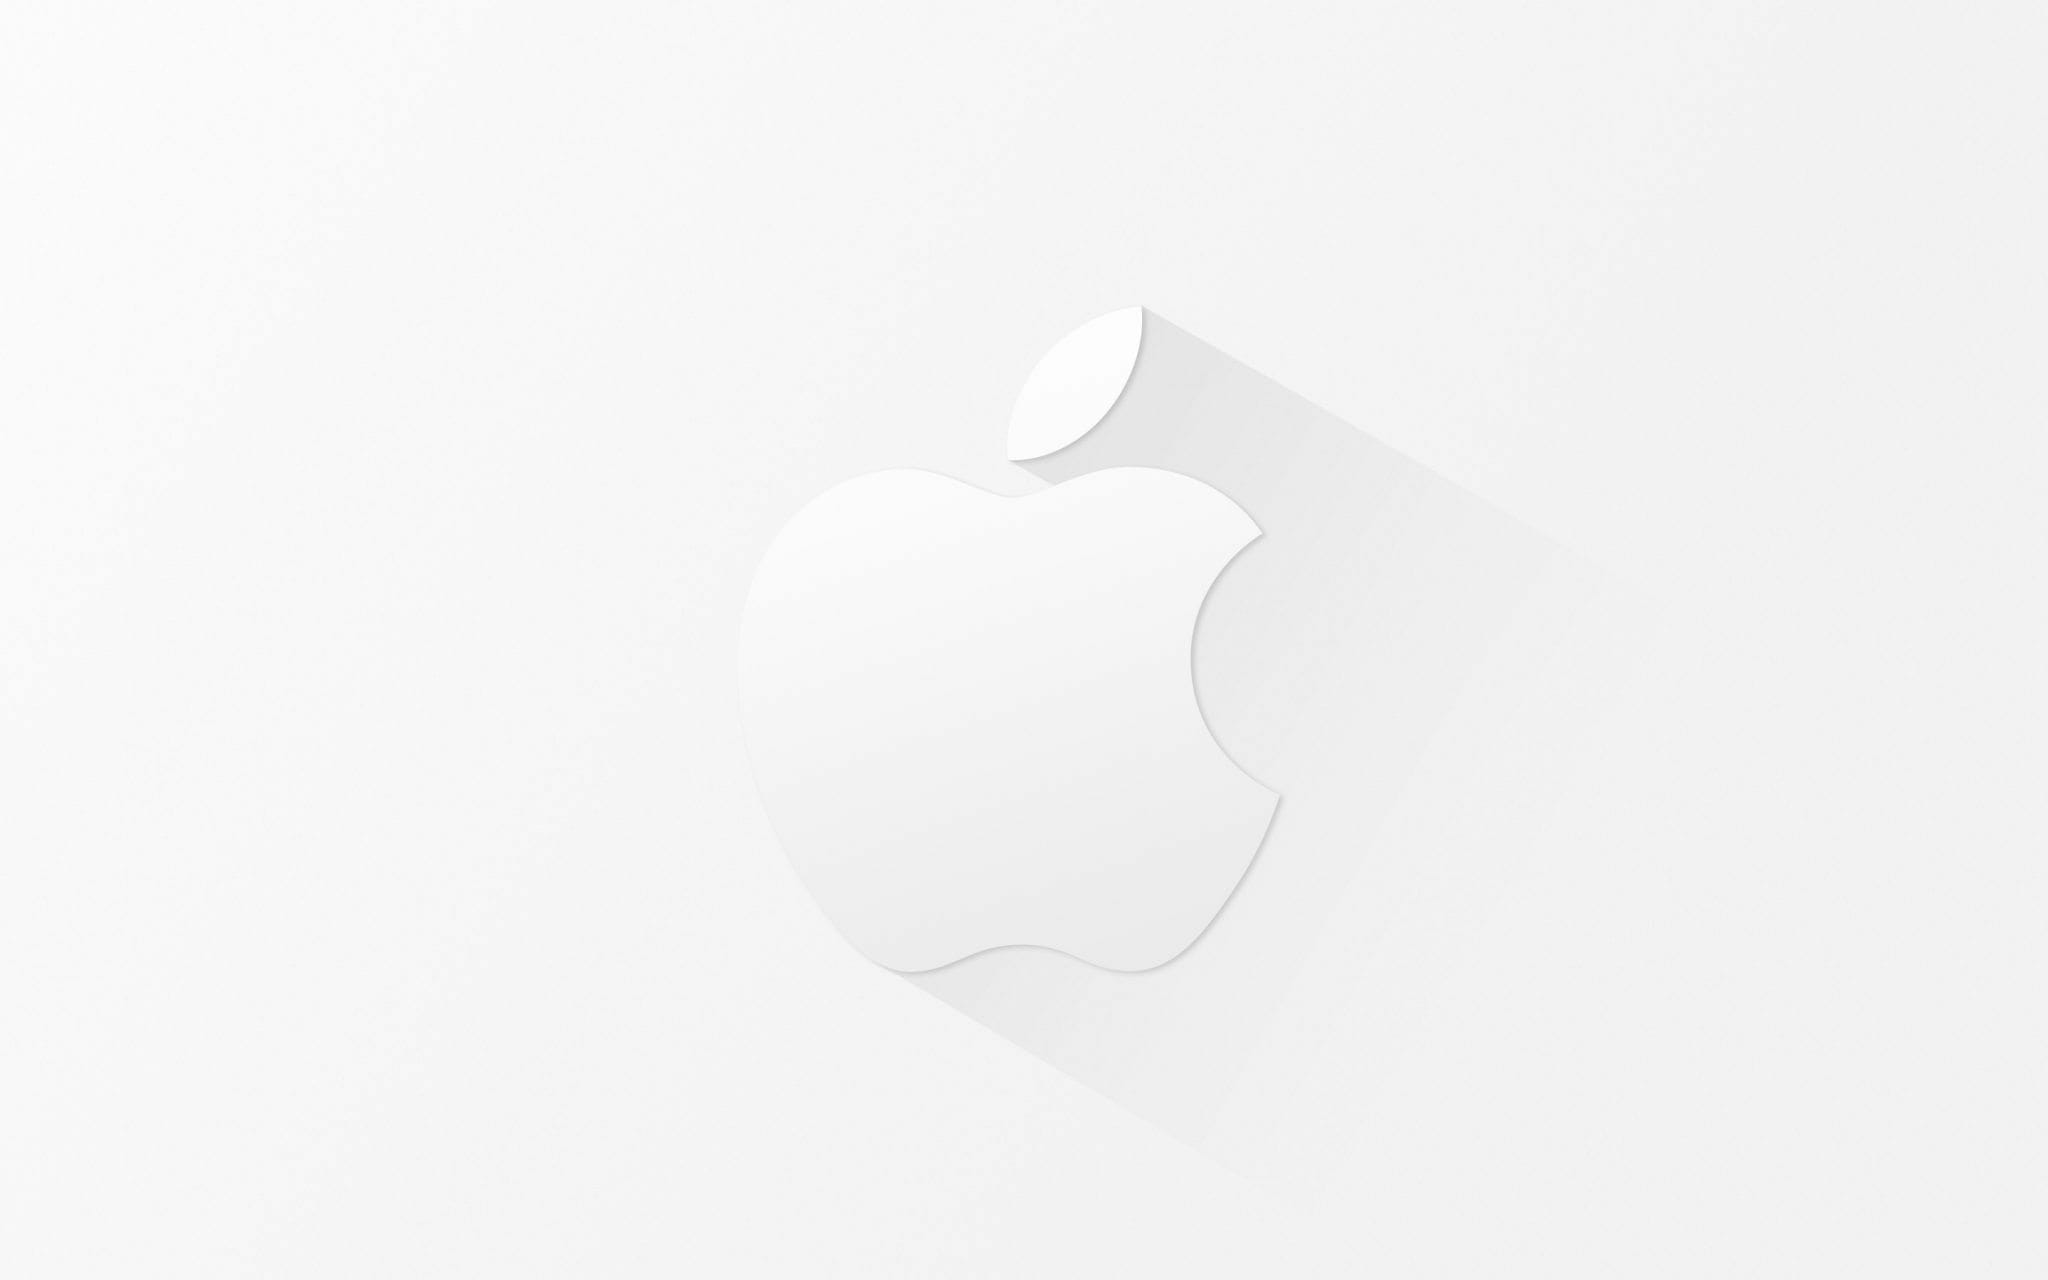 apple-logo-1